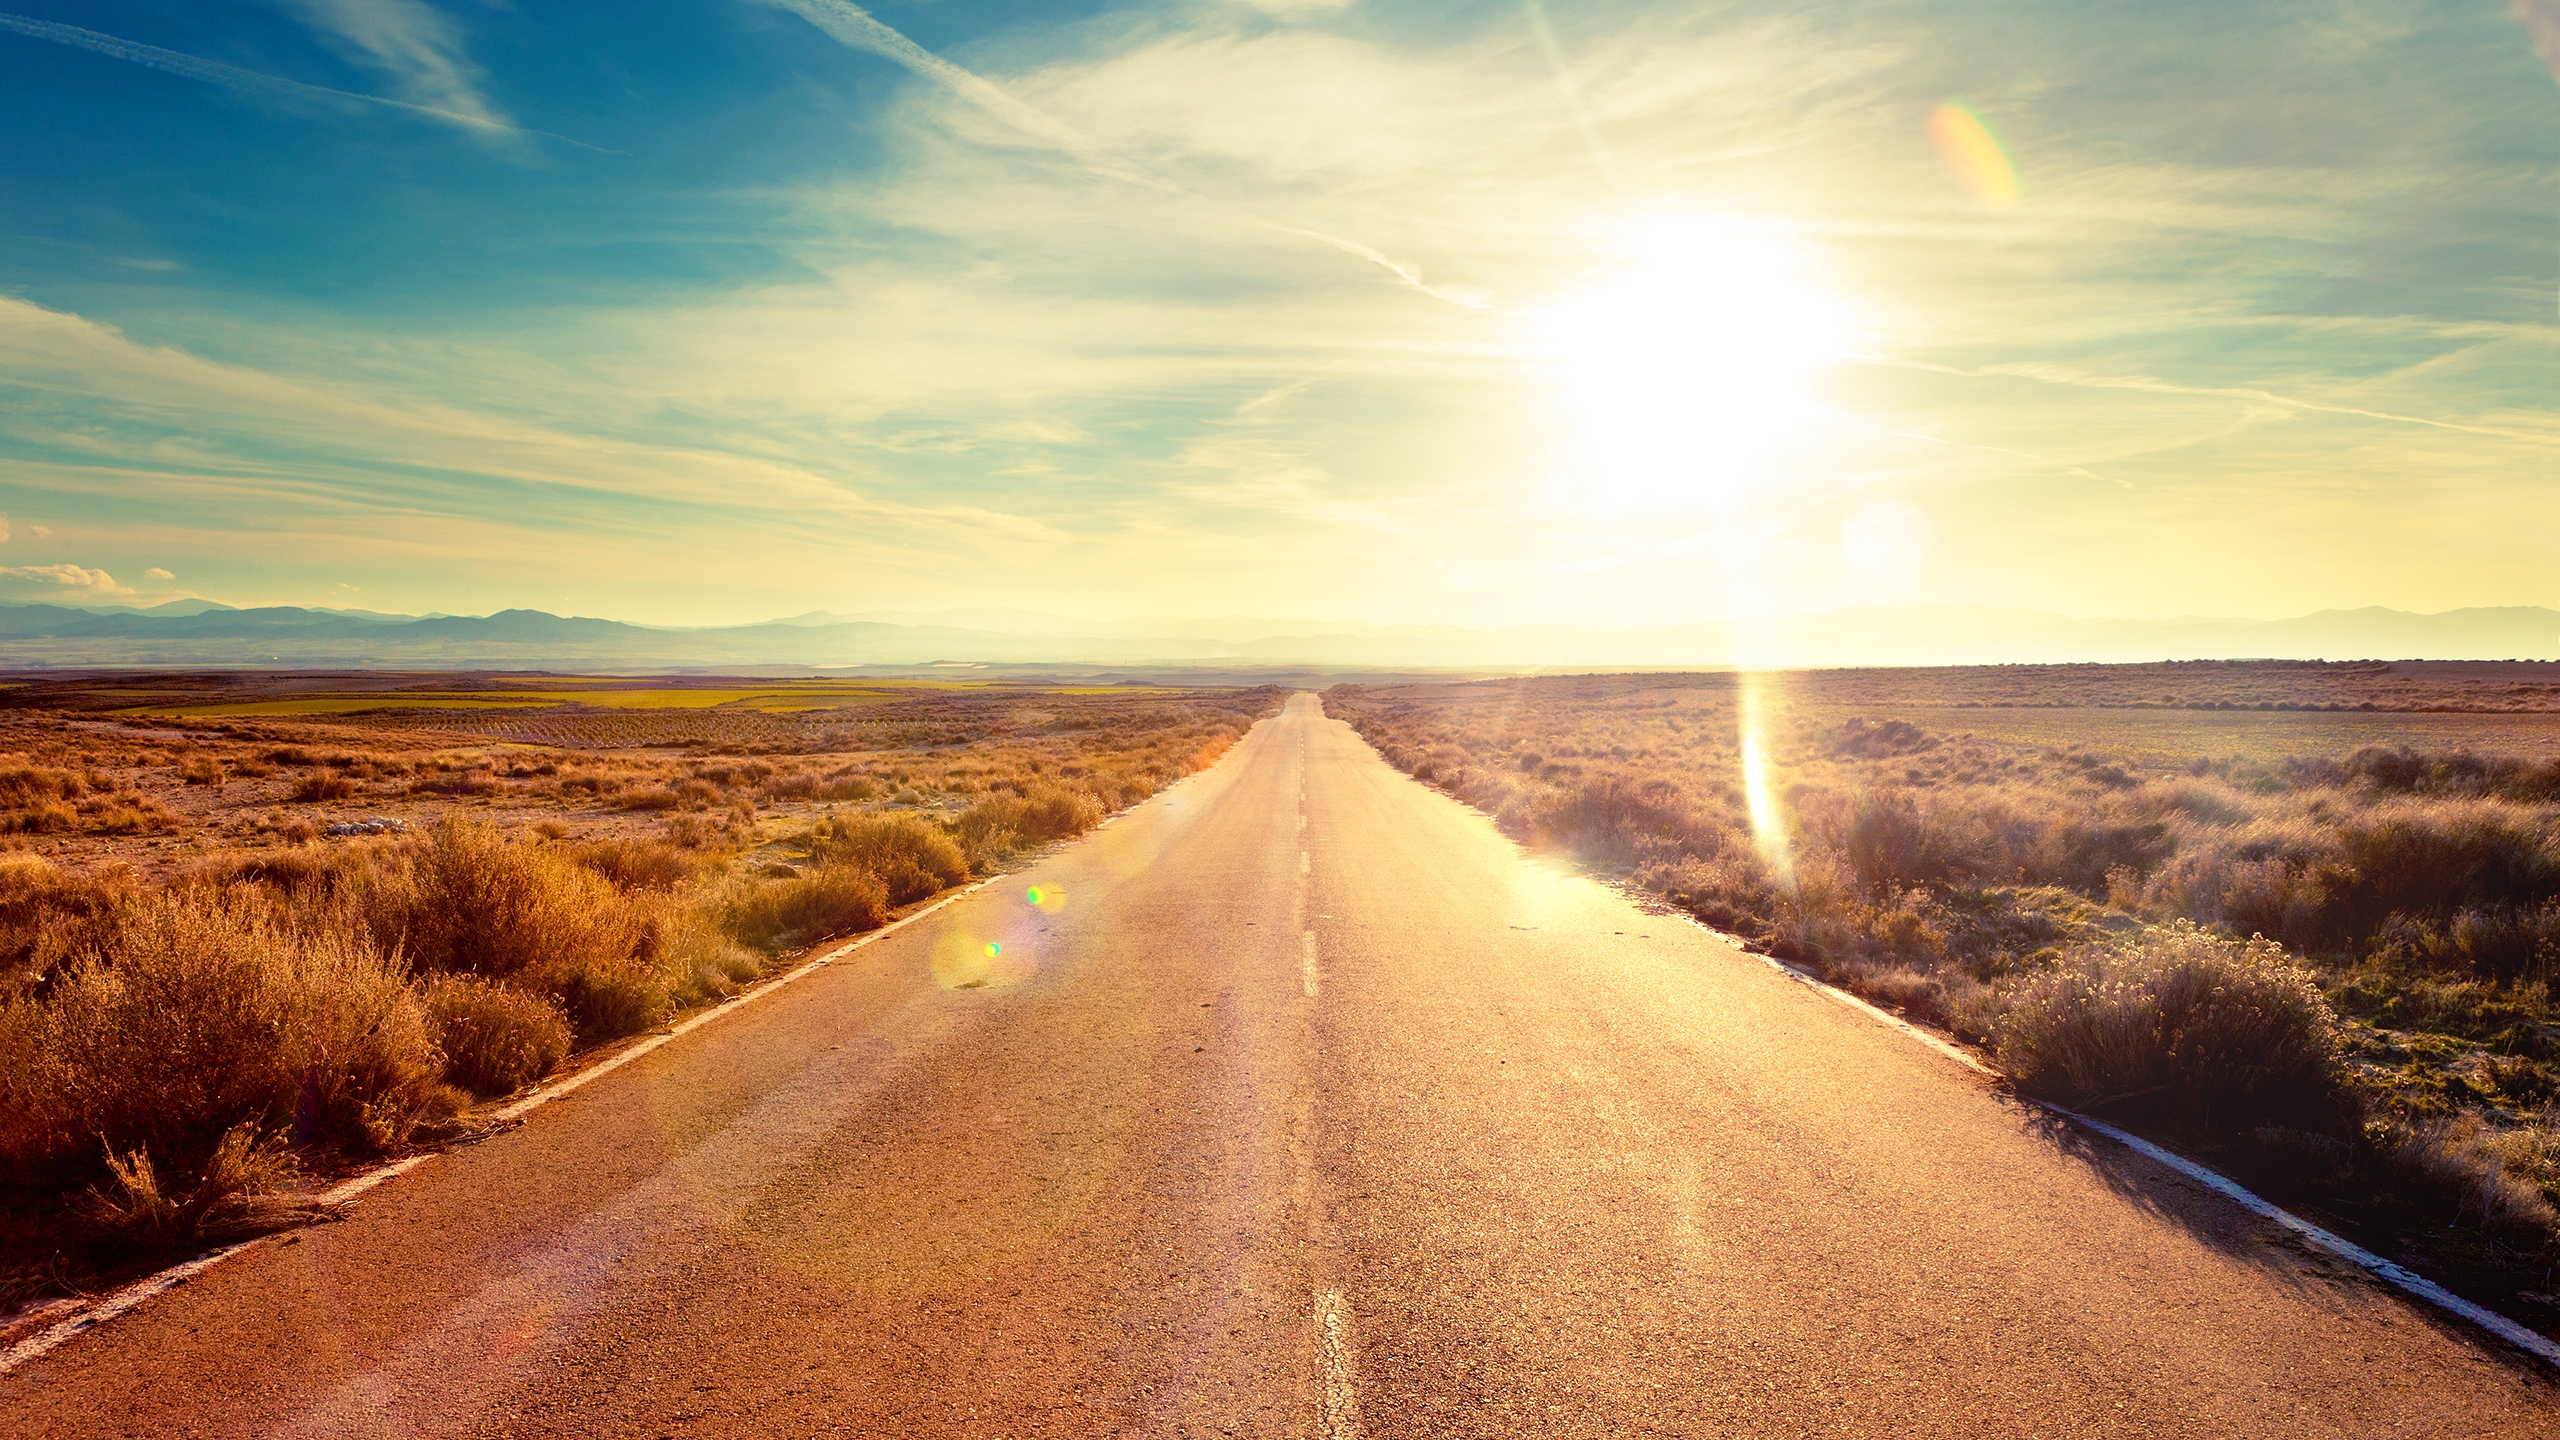 The Sunset Road Hd Wallpaper Wallpaperfx